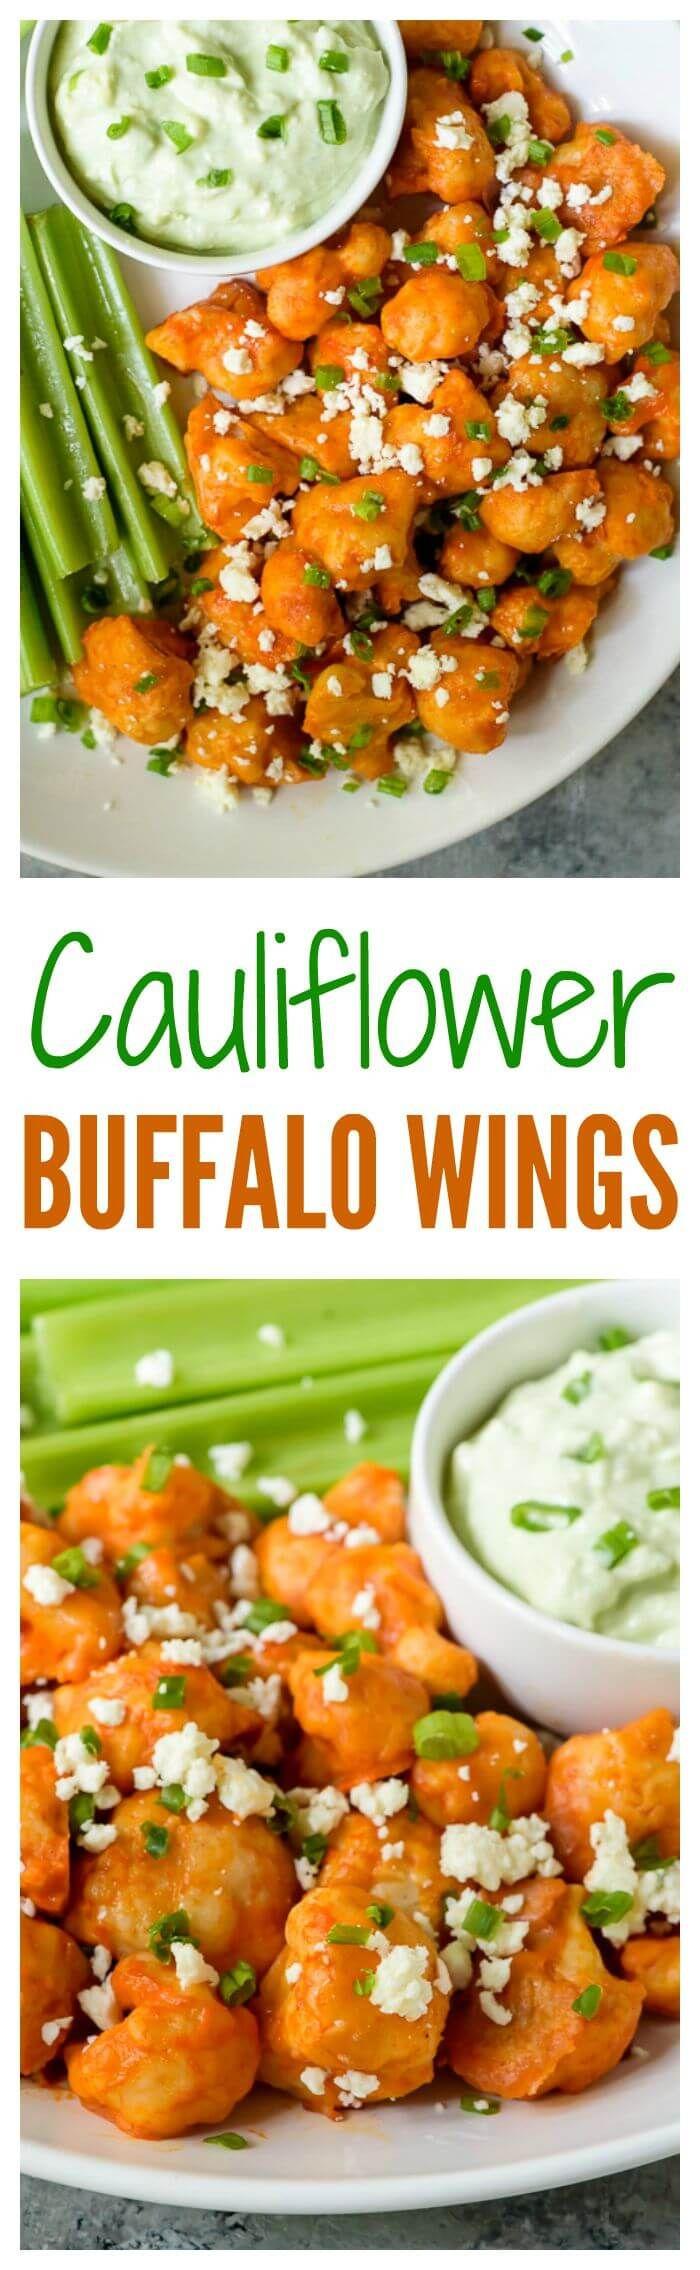 Cauliflower buffalo wings with blue cheese avocado dip for Buffalo fish recipe